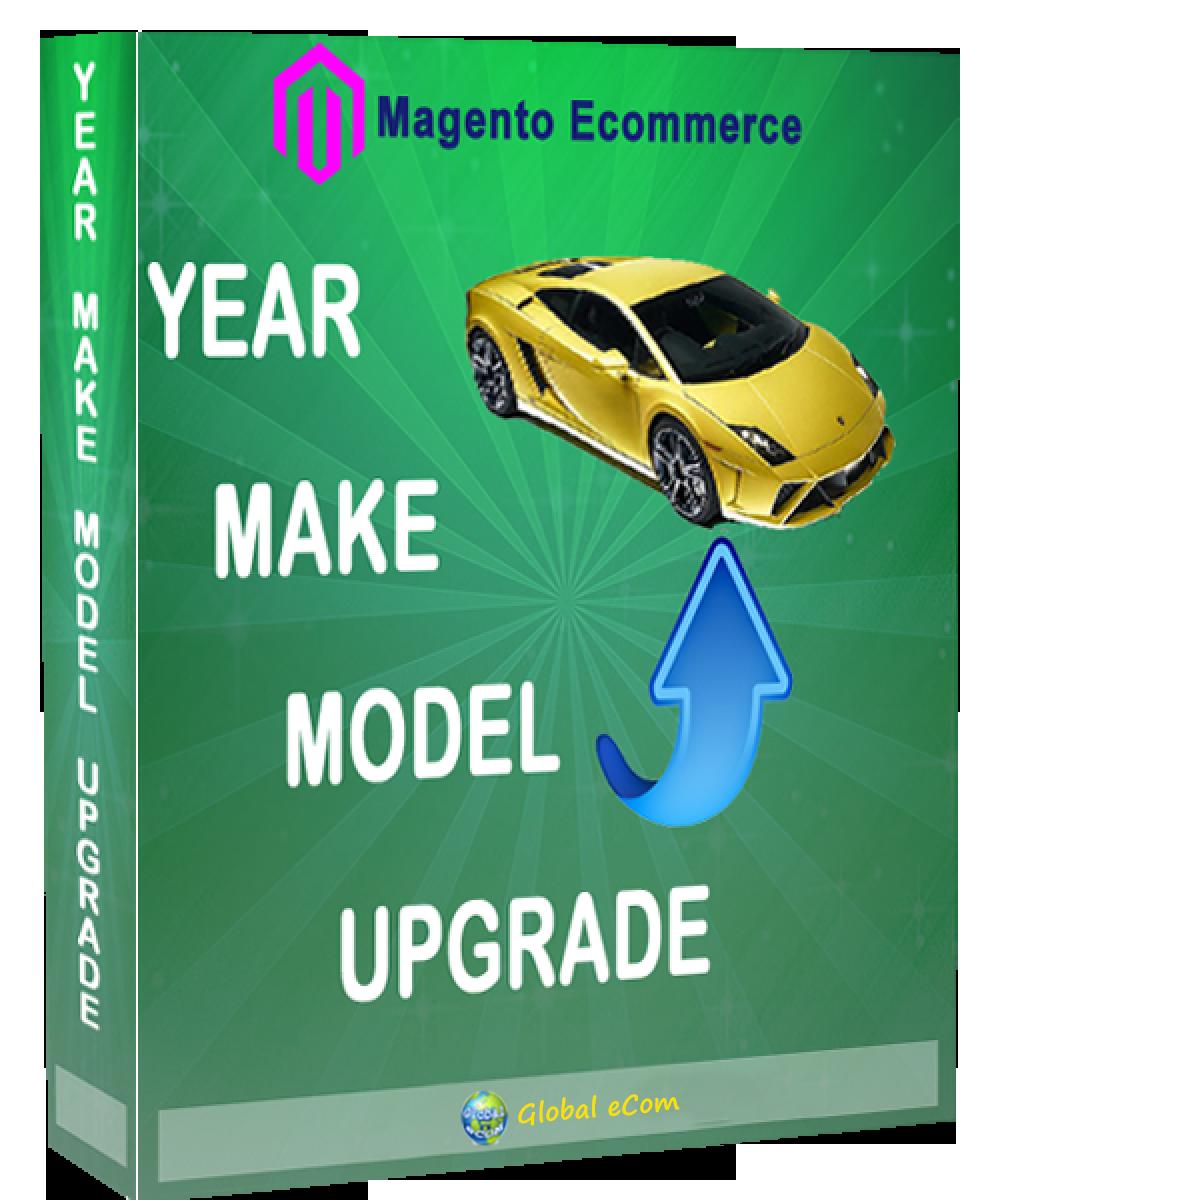 Year Make Model UPGRADE